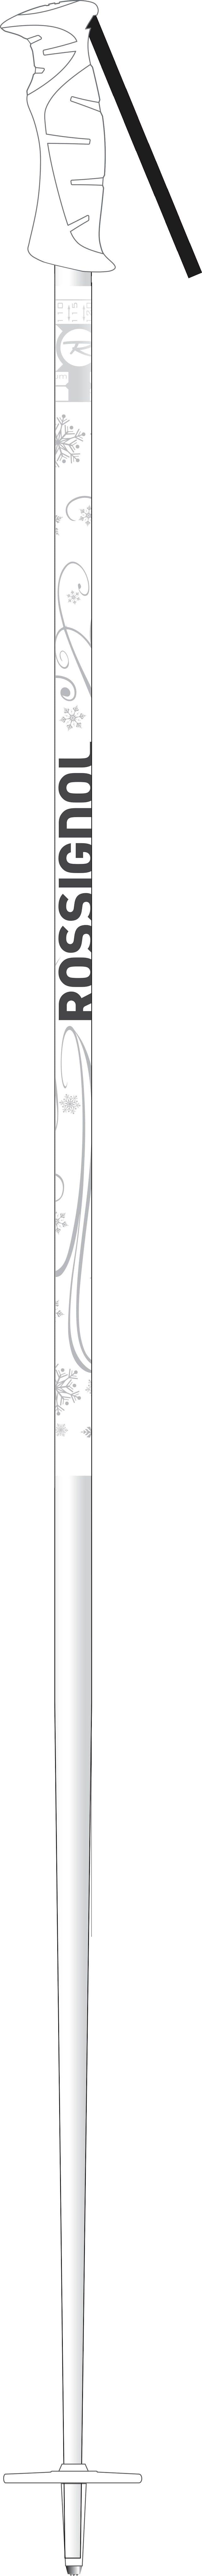 Rossignol Snow Flake Ski Poles